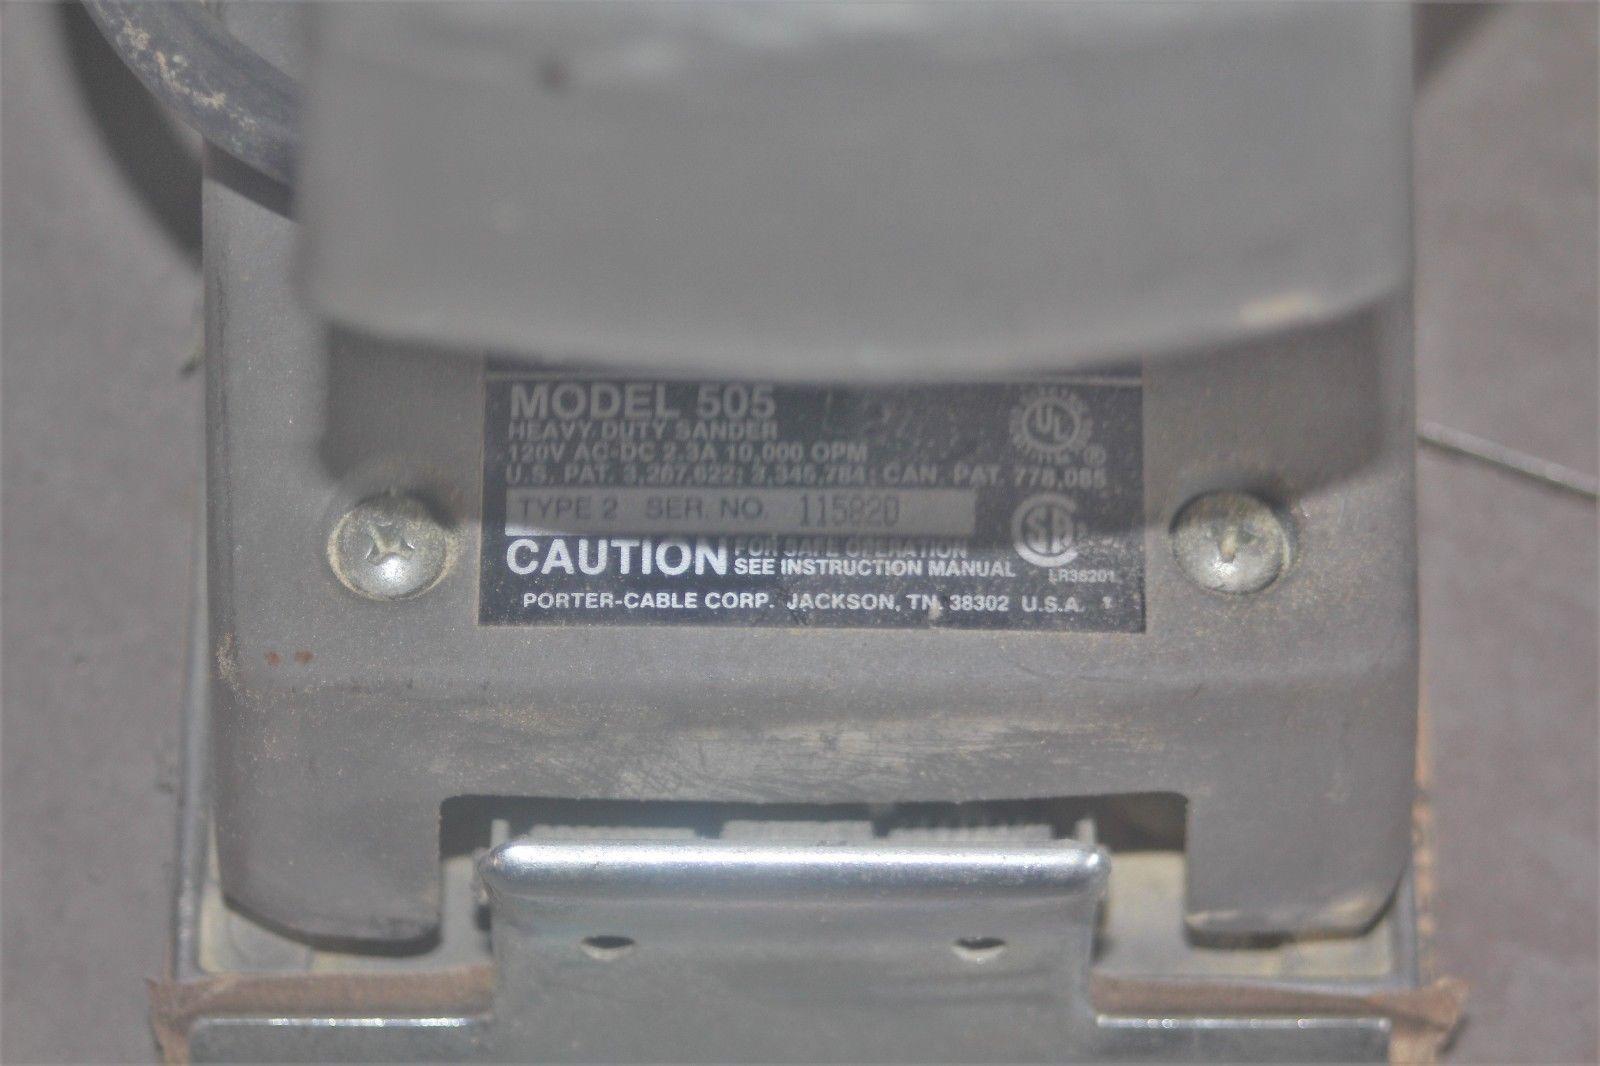 Porter Cable 340 Sander Manual